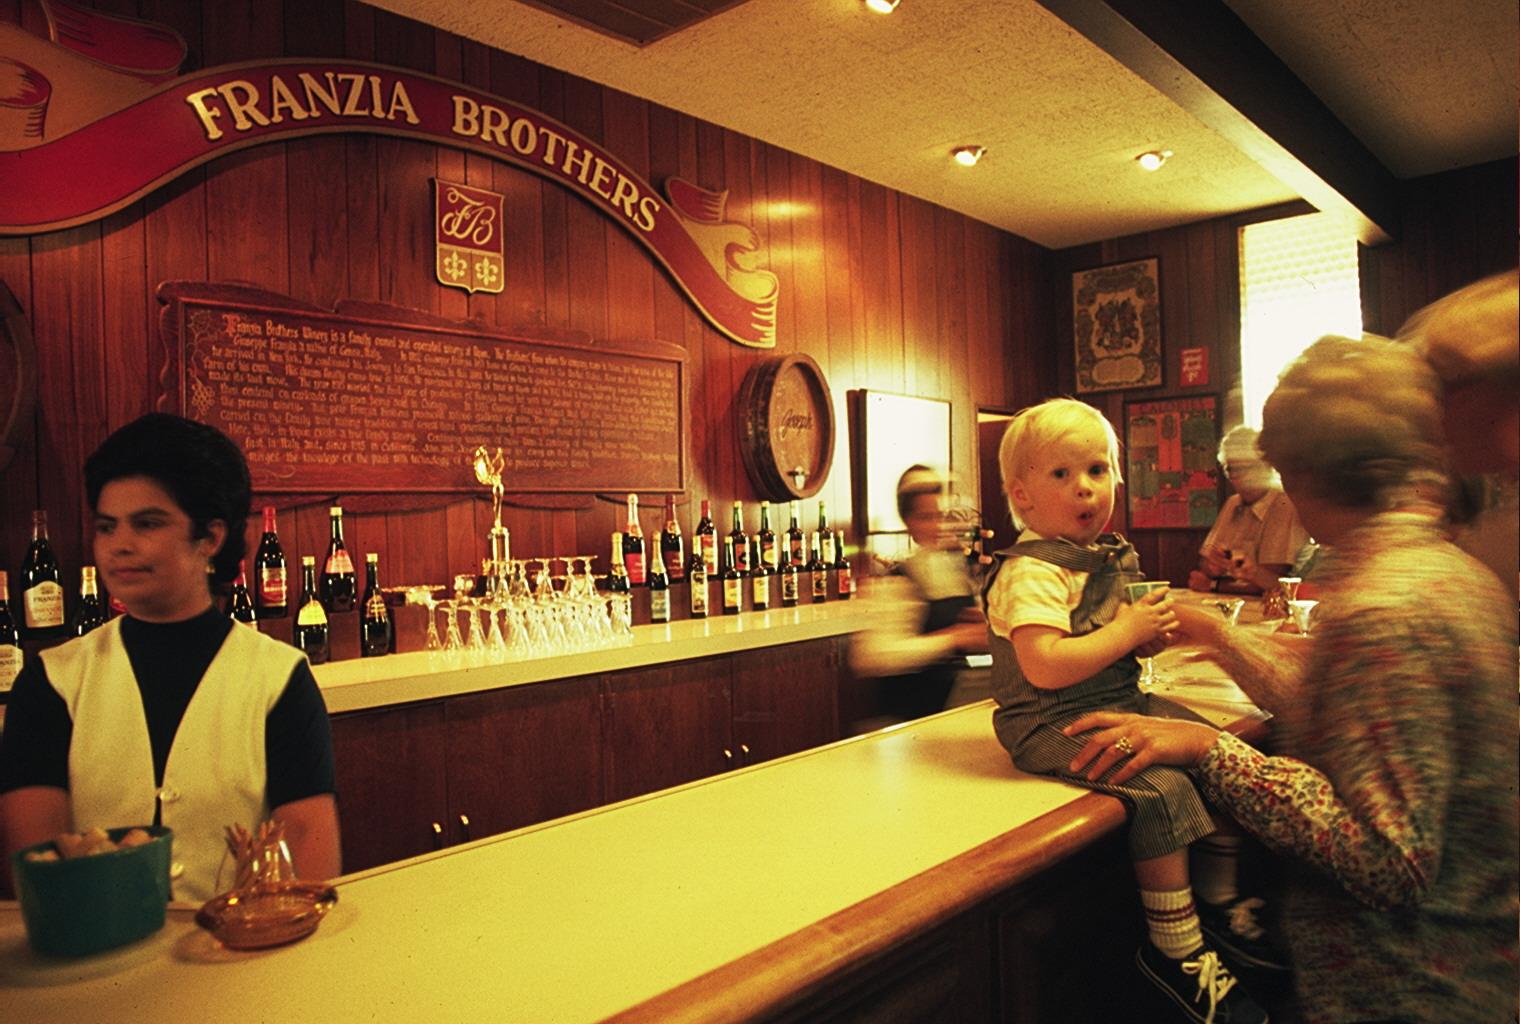 Franzia Brothers Tasting Room